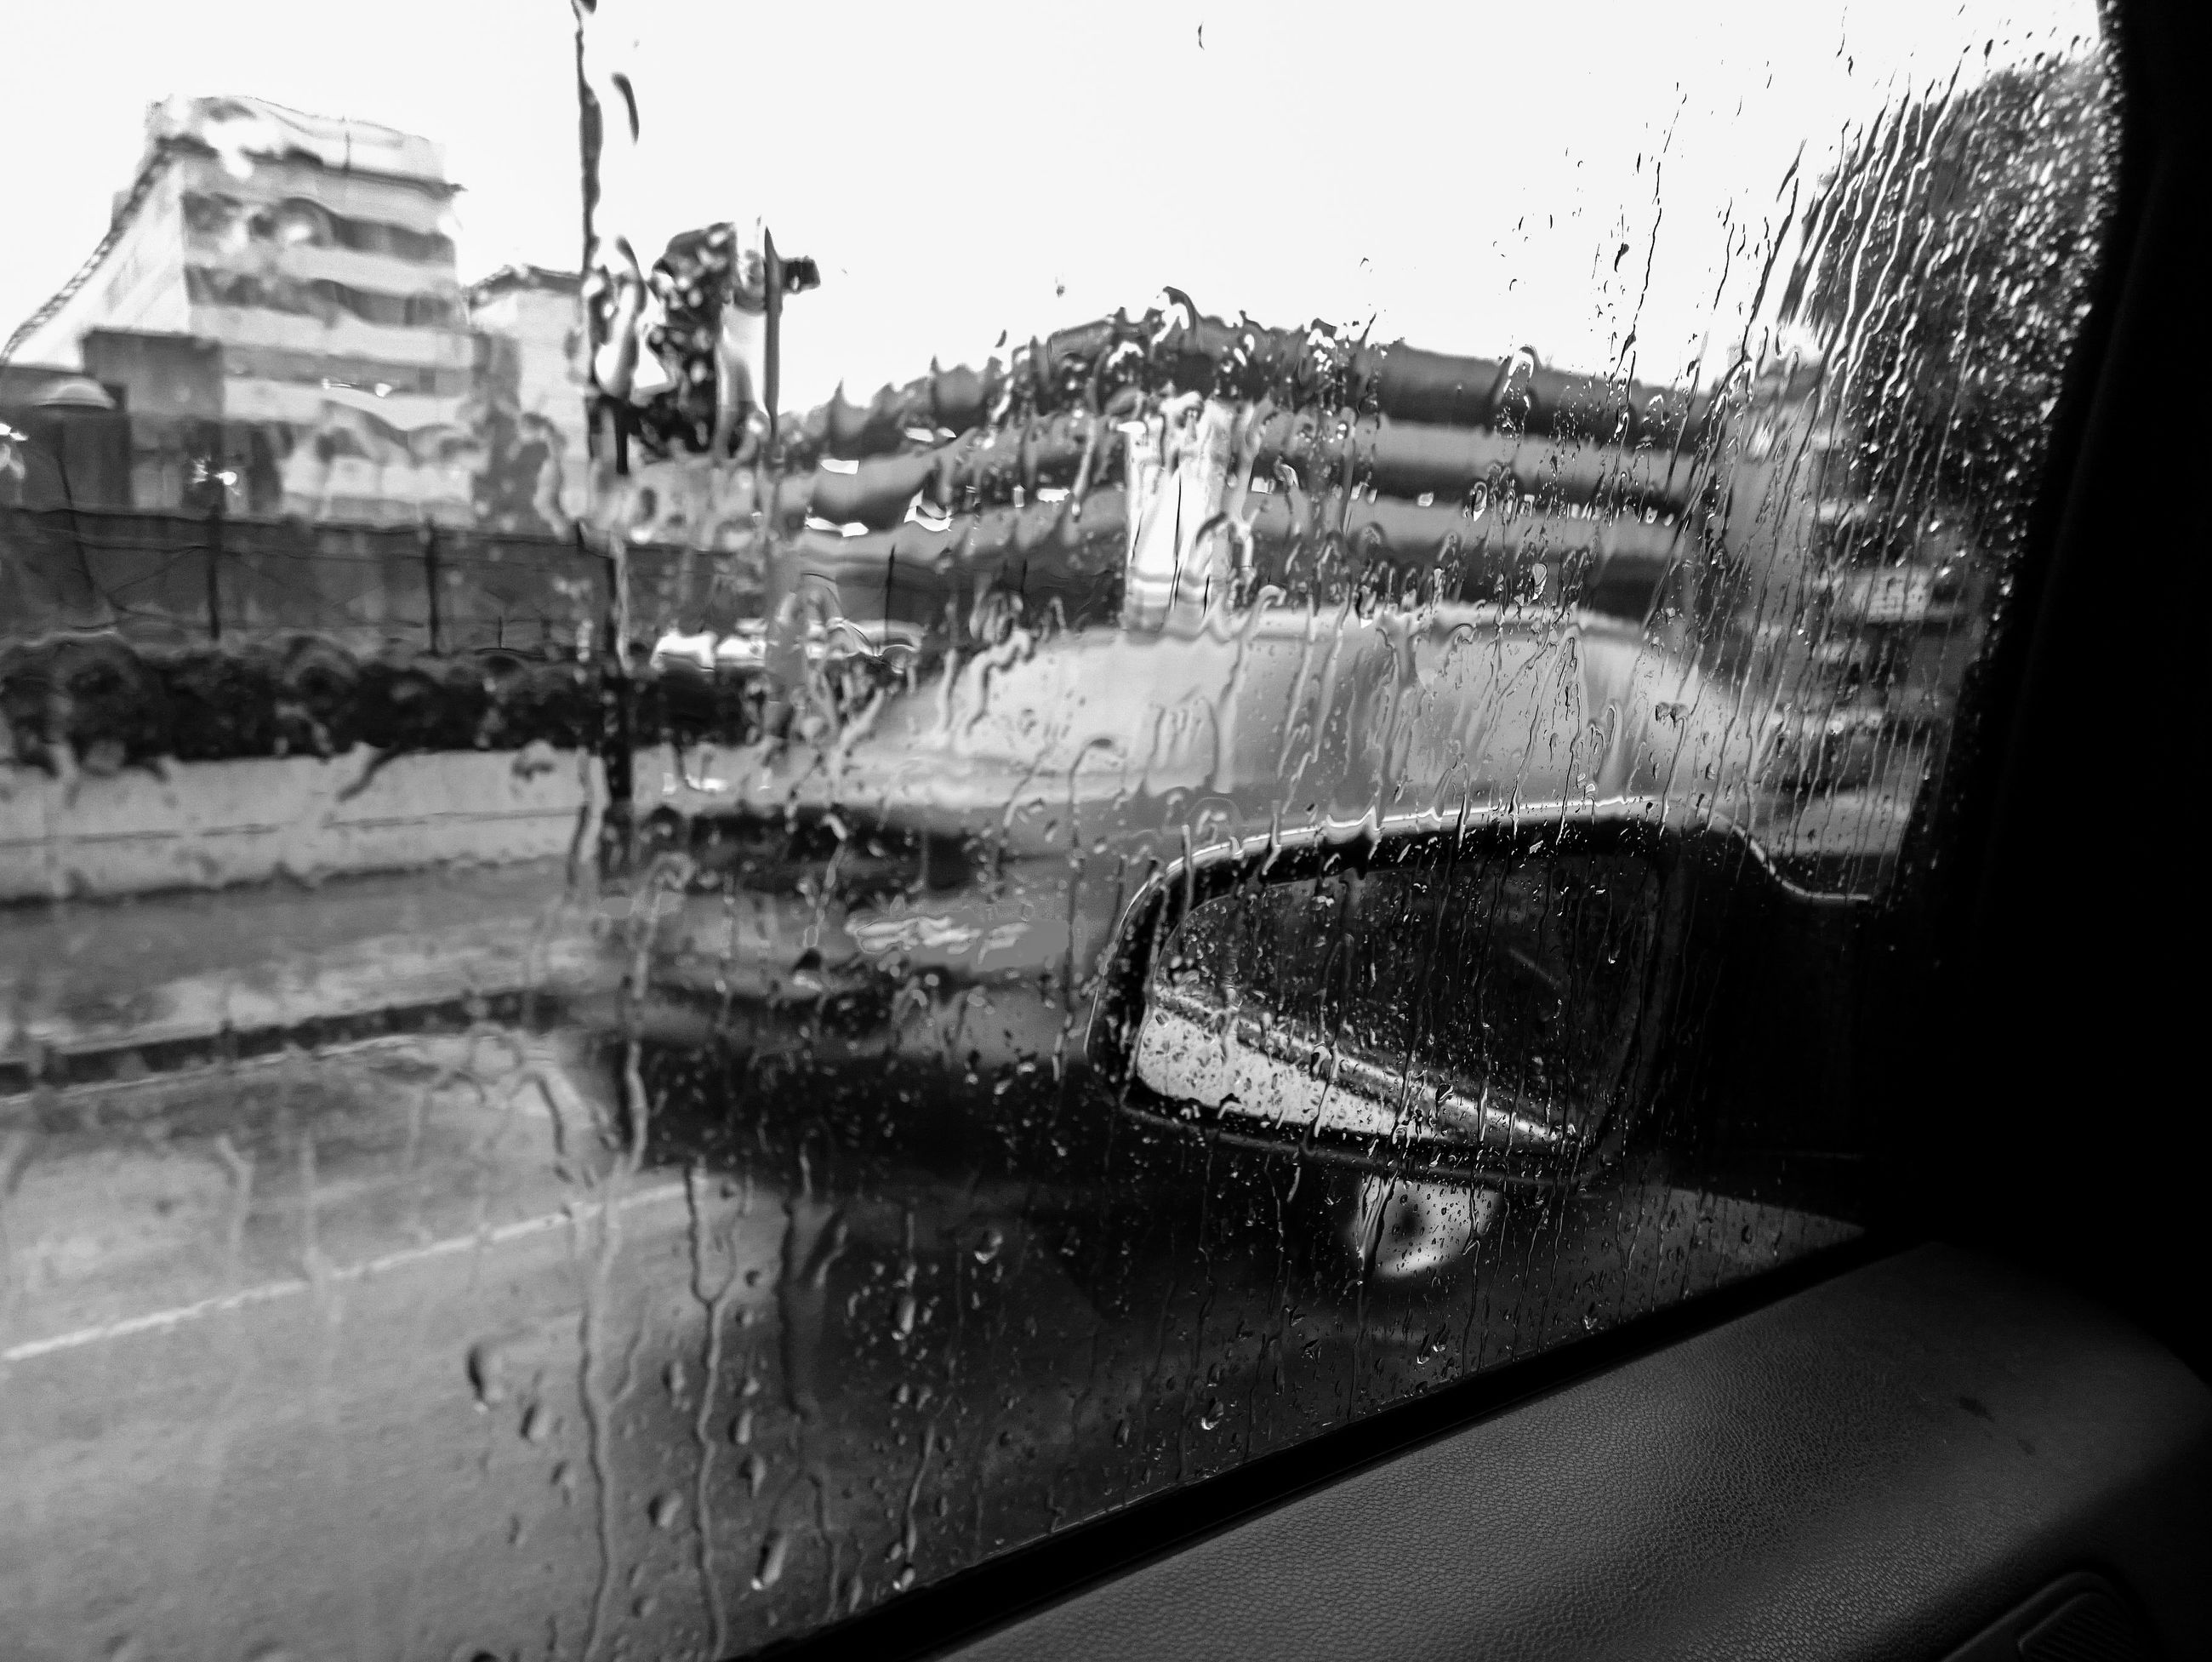 water, architecture, building exterior, built structure, wet, transportation, motion, mode of transport, drop, fountain, rain, car, city, splashing, land vehicle, glass - material, street, transparent, spraying, window